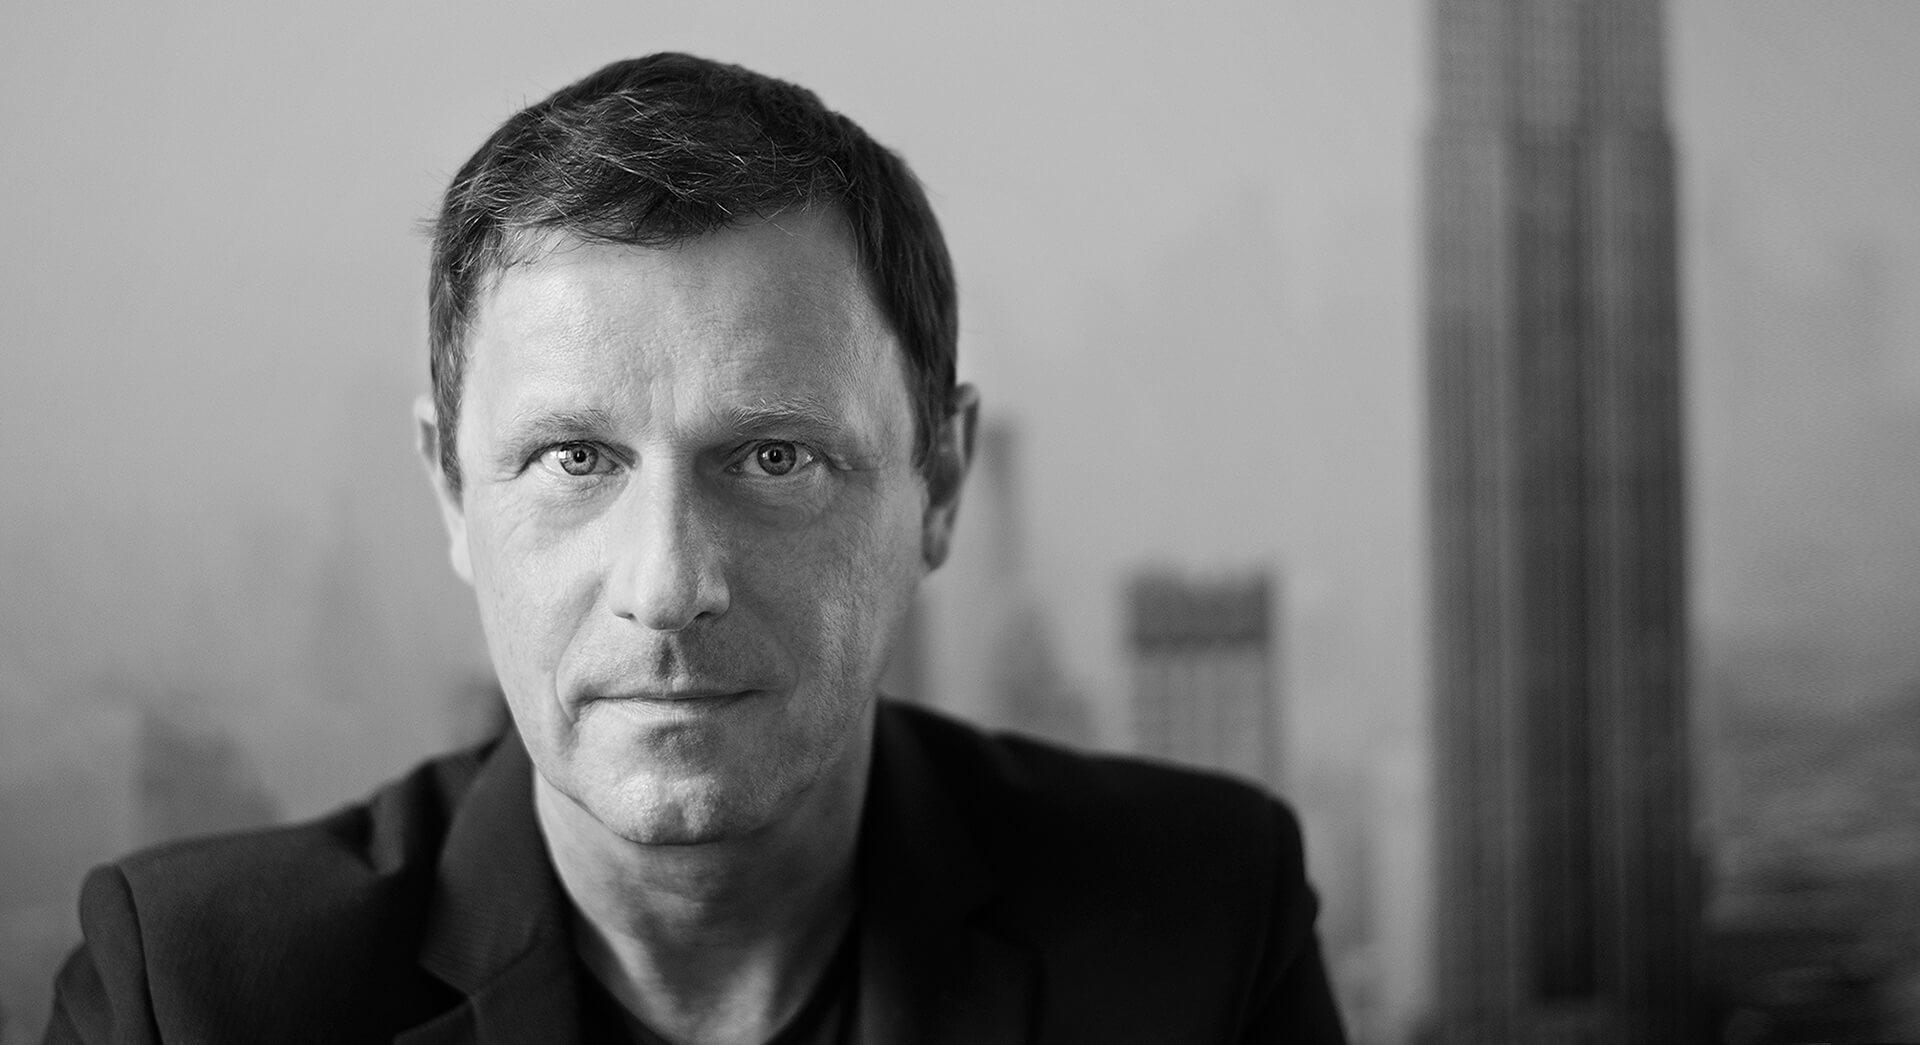 Reingold - Werbung für Menschen & Marken - Geschäftsführung - Michael Rupprecht